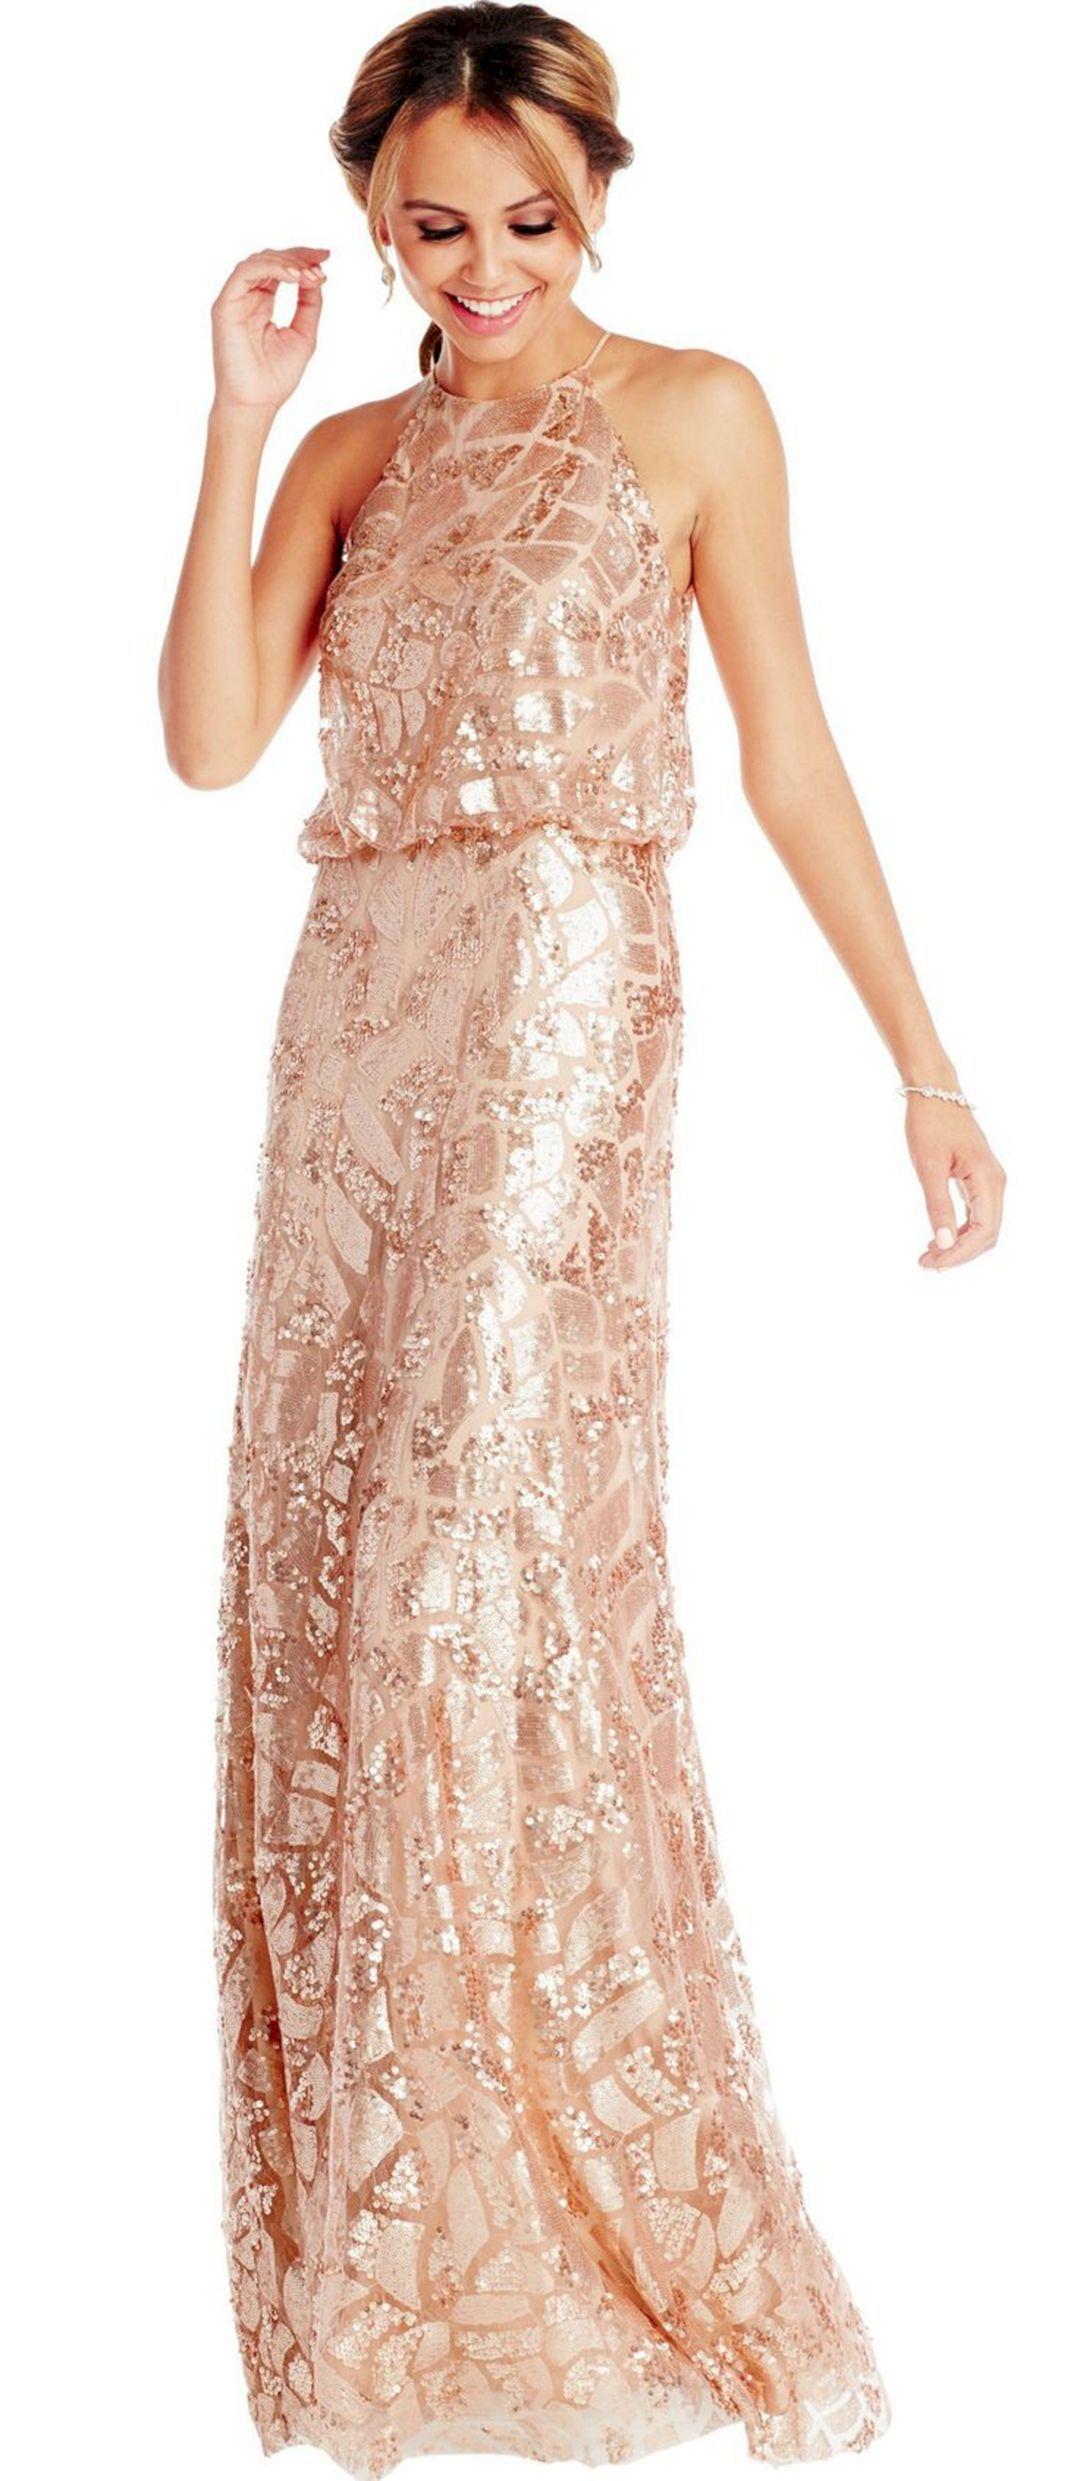 Adorable 15 Brilliant Gold Long Wedding Dresses For Bridesmaid Ideas  https   oosile. fa415ee00